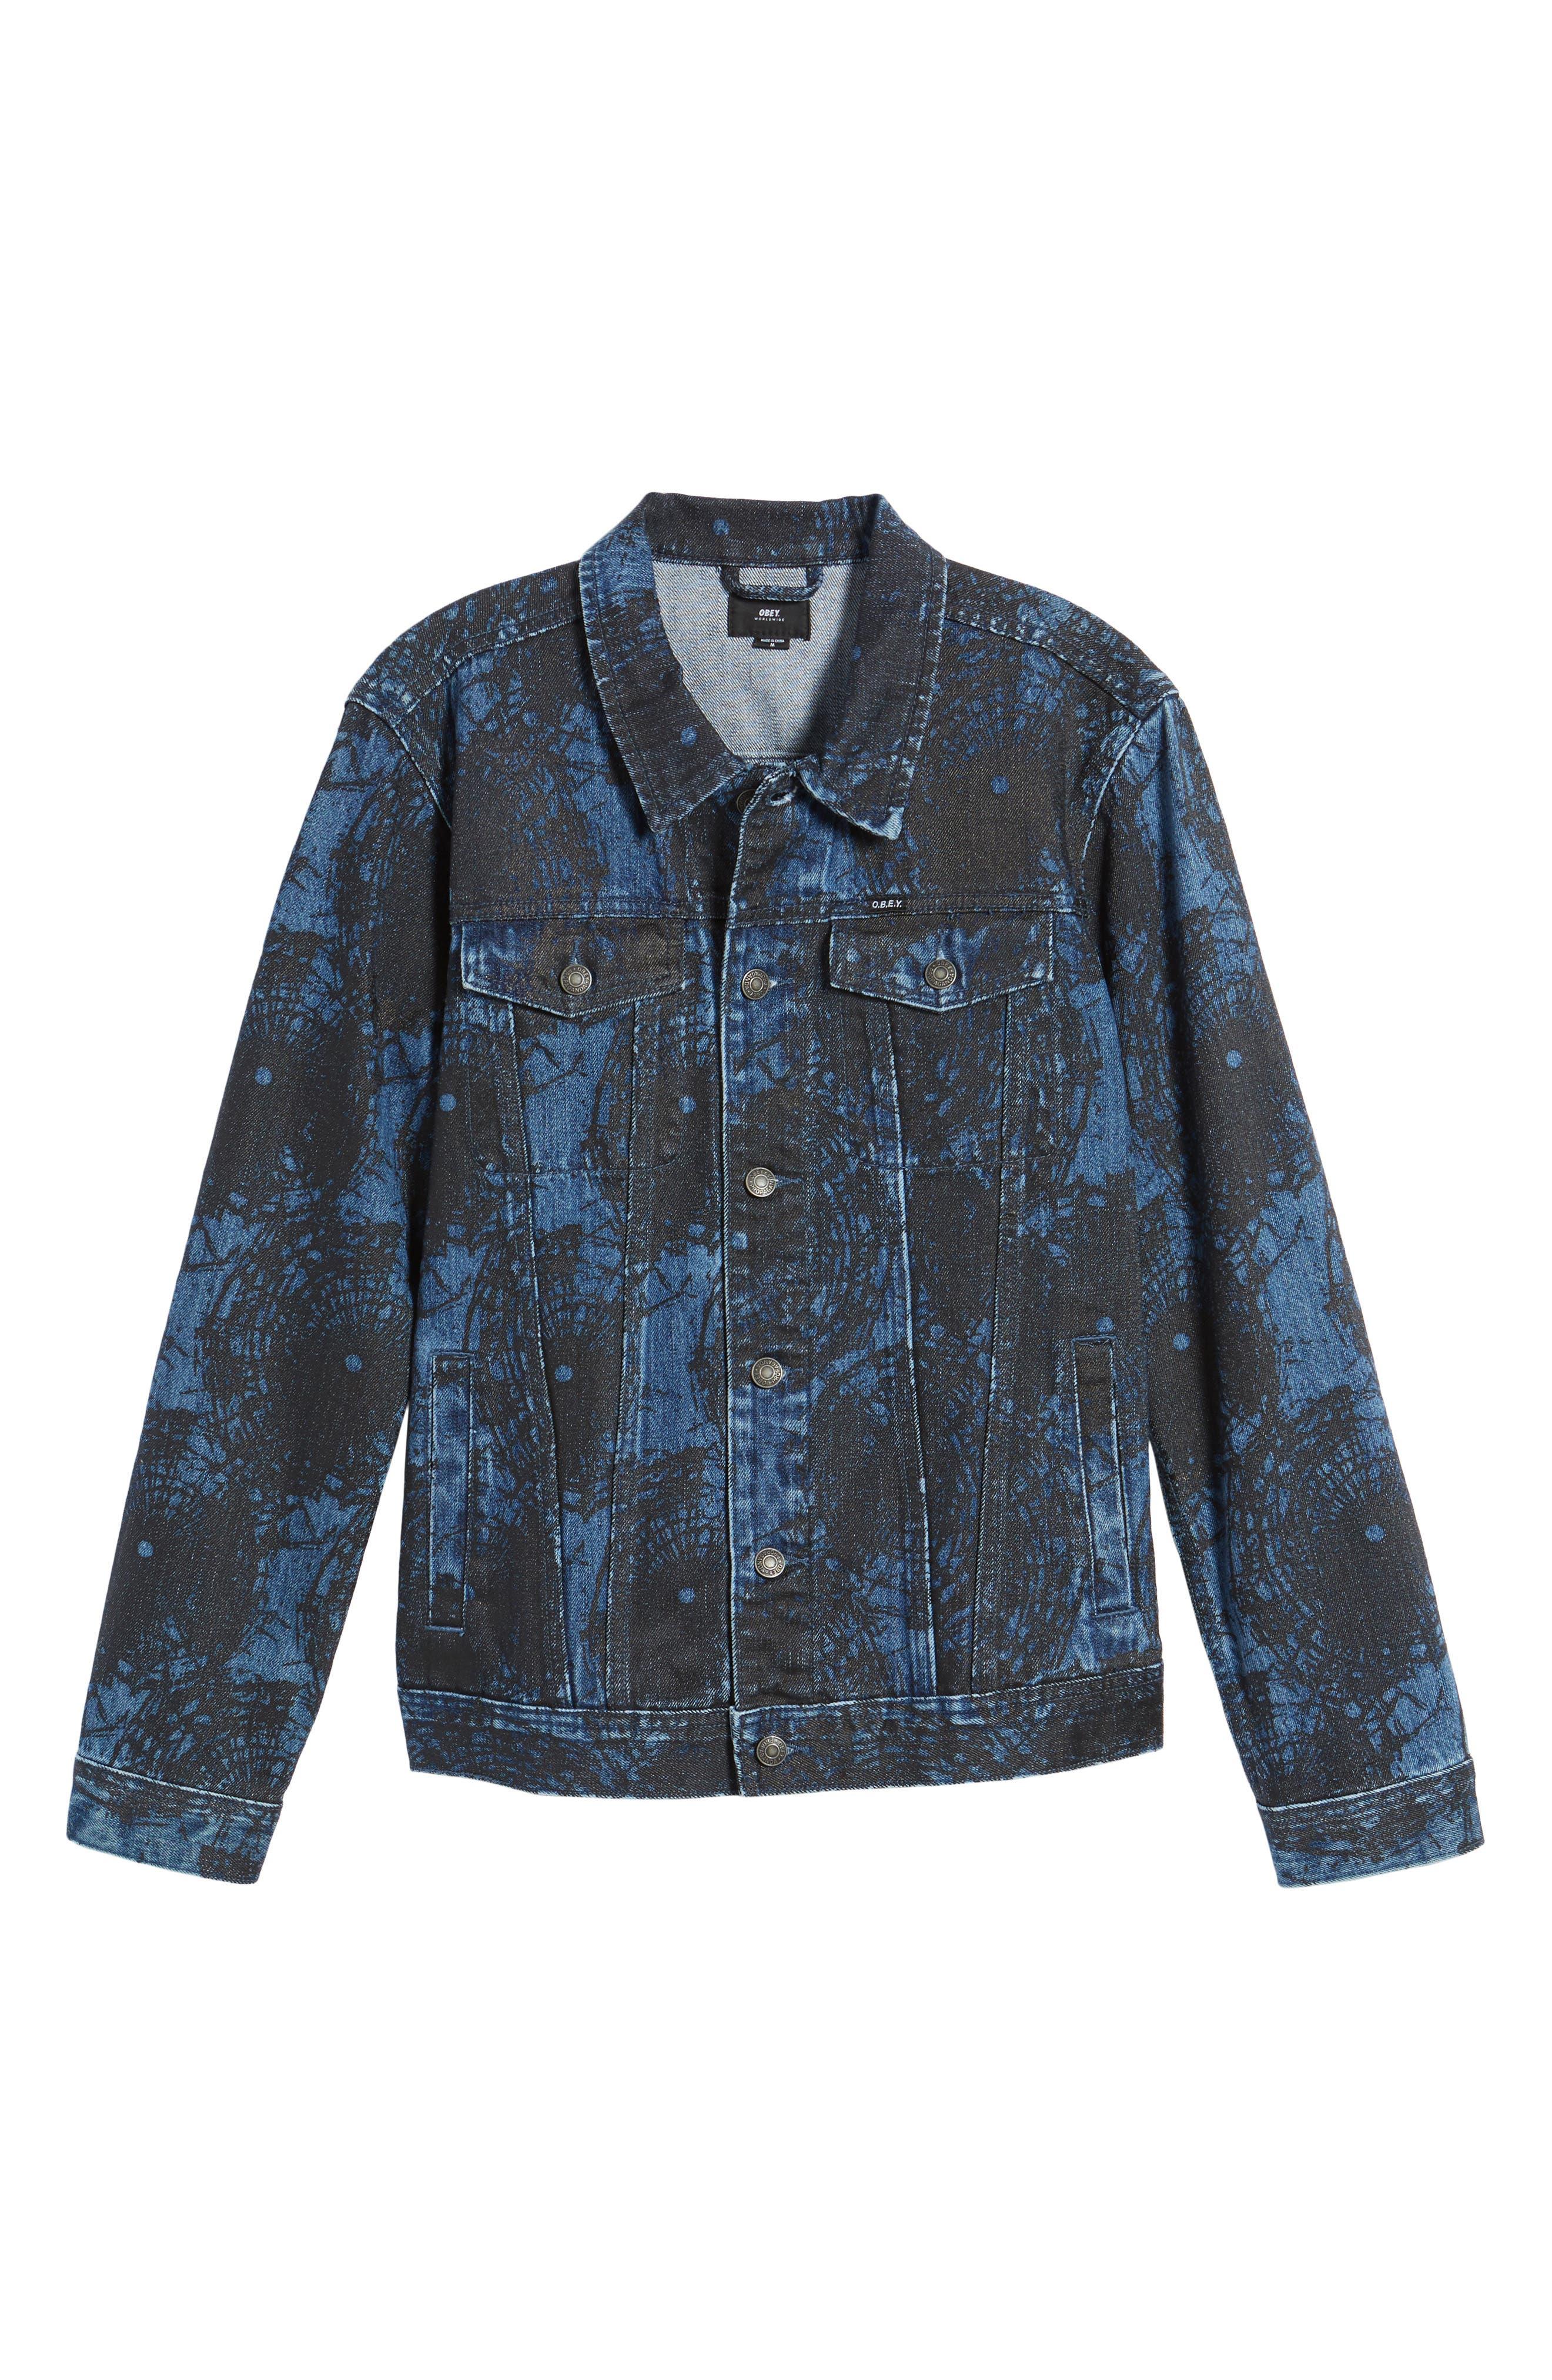 Shattered Denim Jacket,                             Alternate thumbnail 5, color,                             002